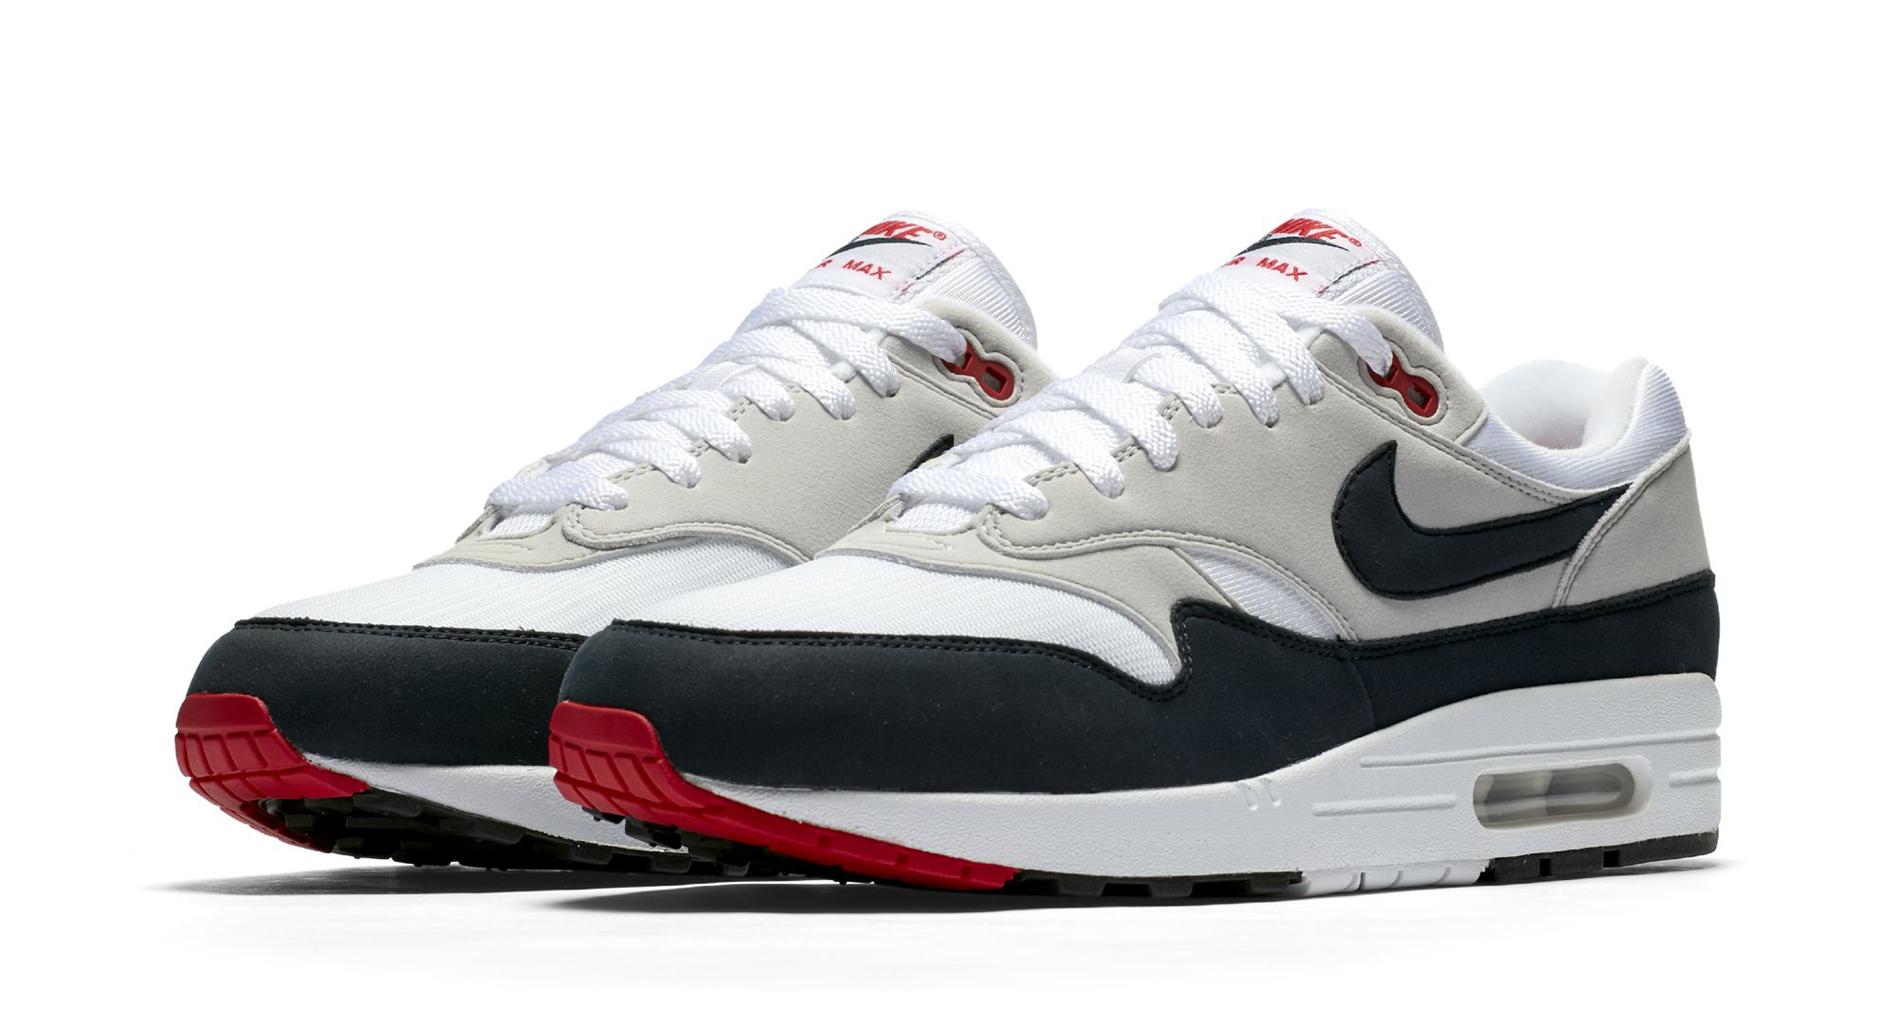 9f214df7e8c 1900 x 1014 www.nicekicks.com. Nike Air Max 1 ...